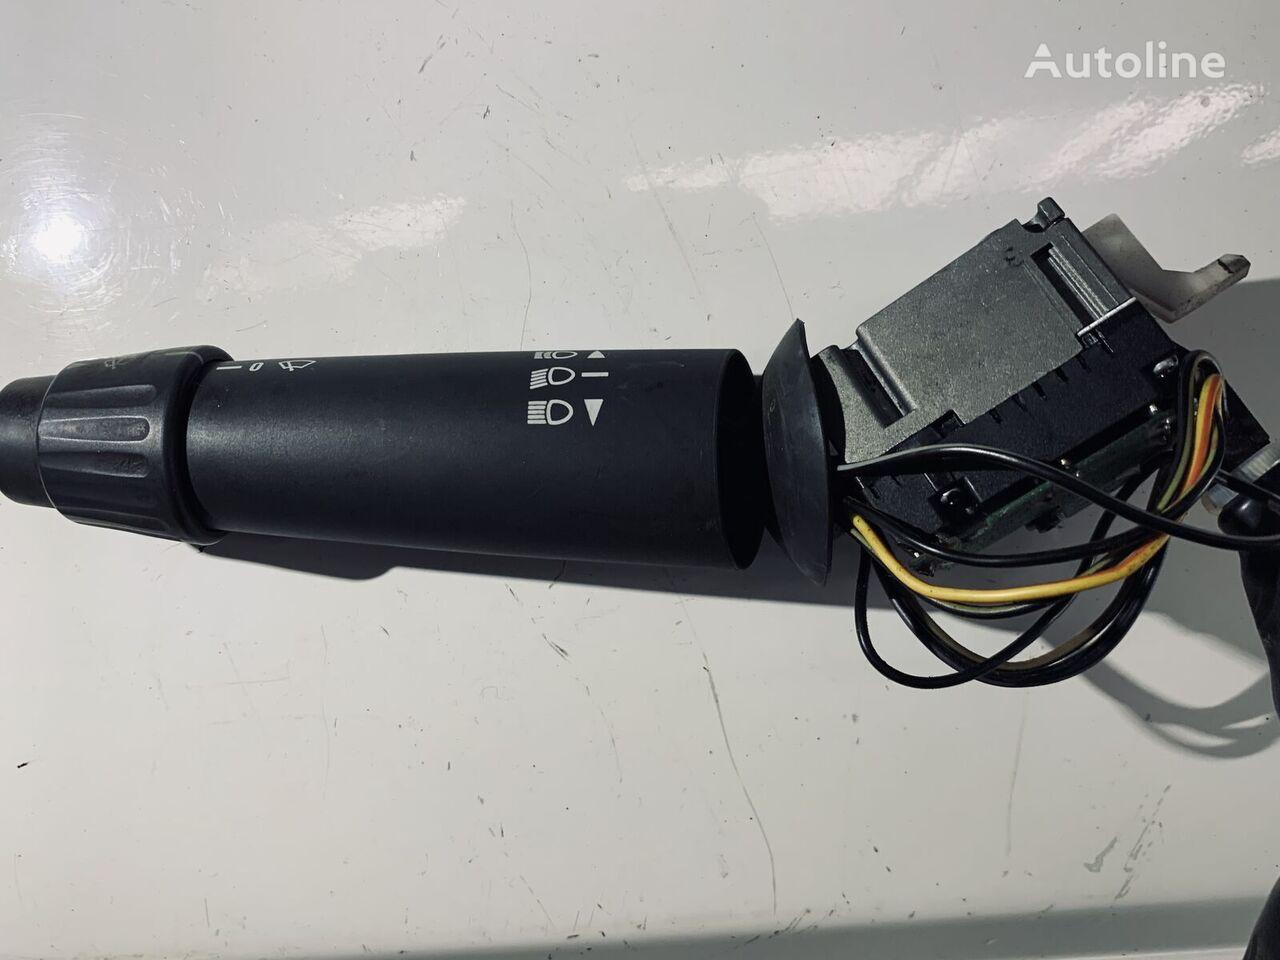 MERCEDES-BENZ ACTROS (102190-16) understeering switch for tractor unit